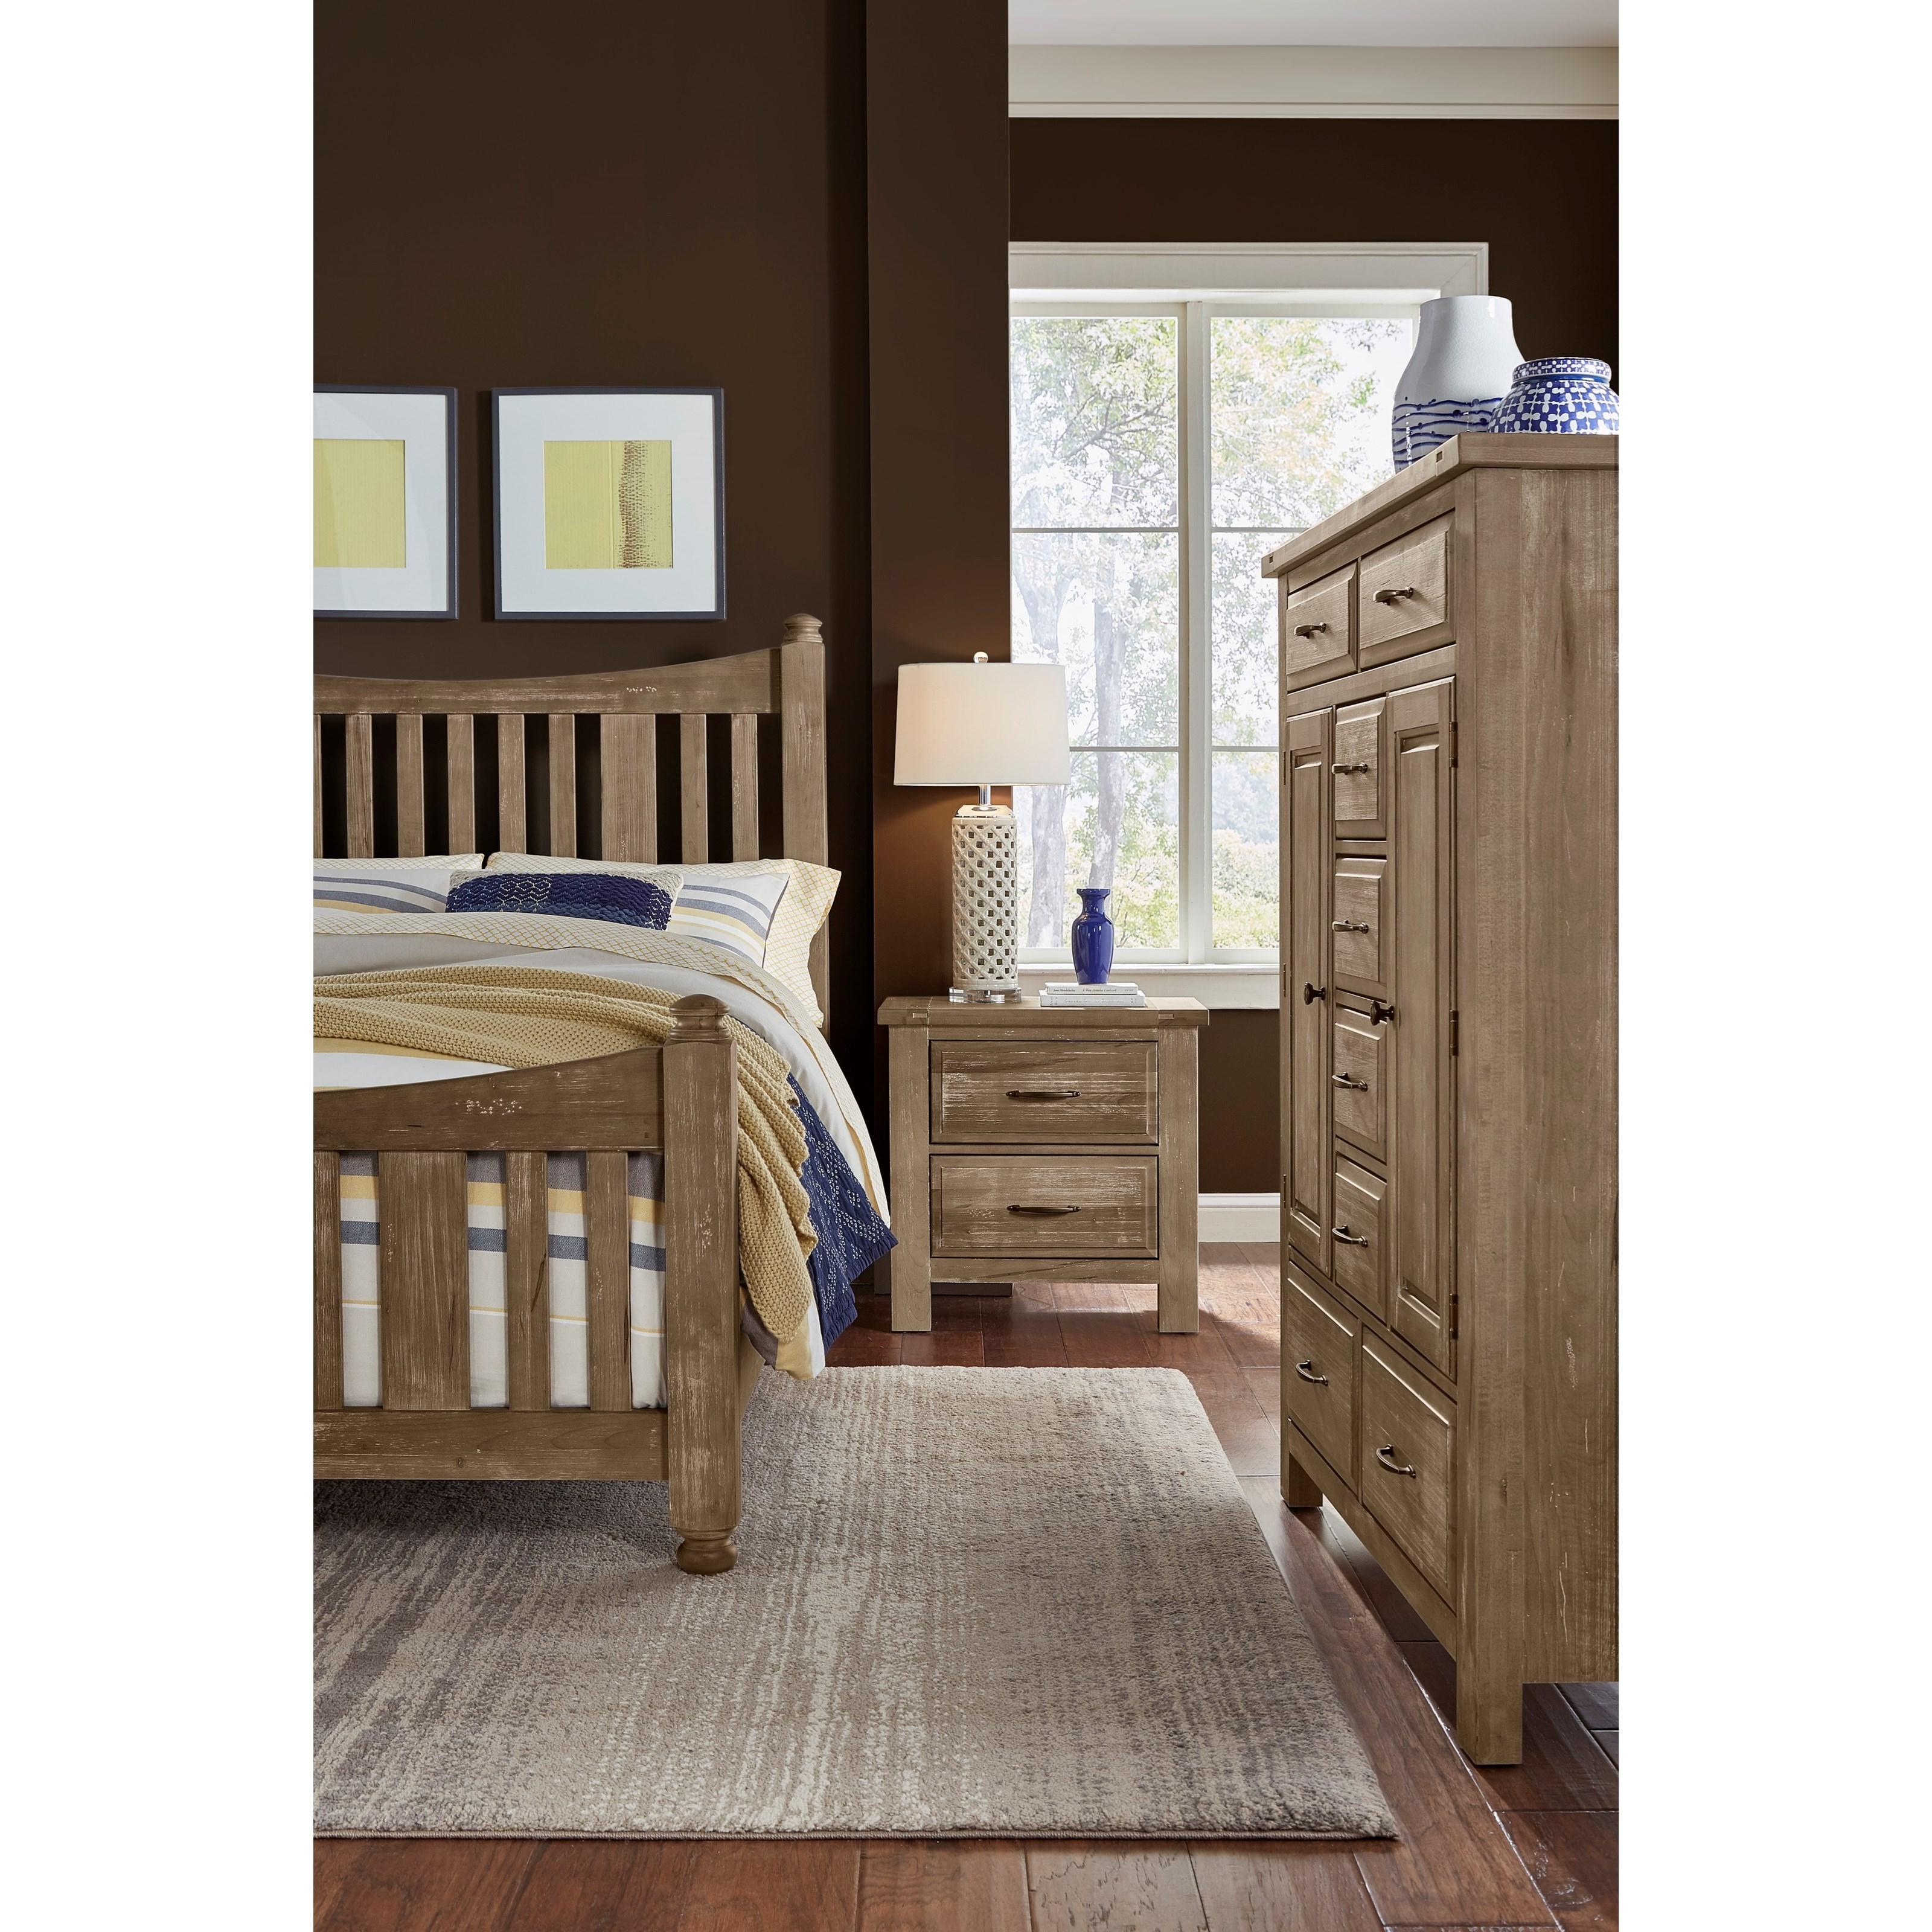 Artisan & Post Maple Road Queen Bedroom Group - Item Number: 115 Q Bedroom Group 4